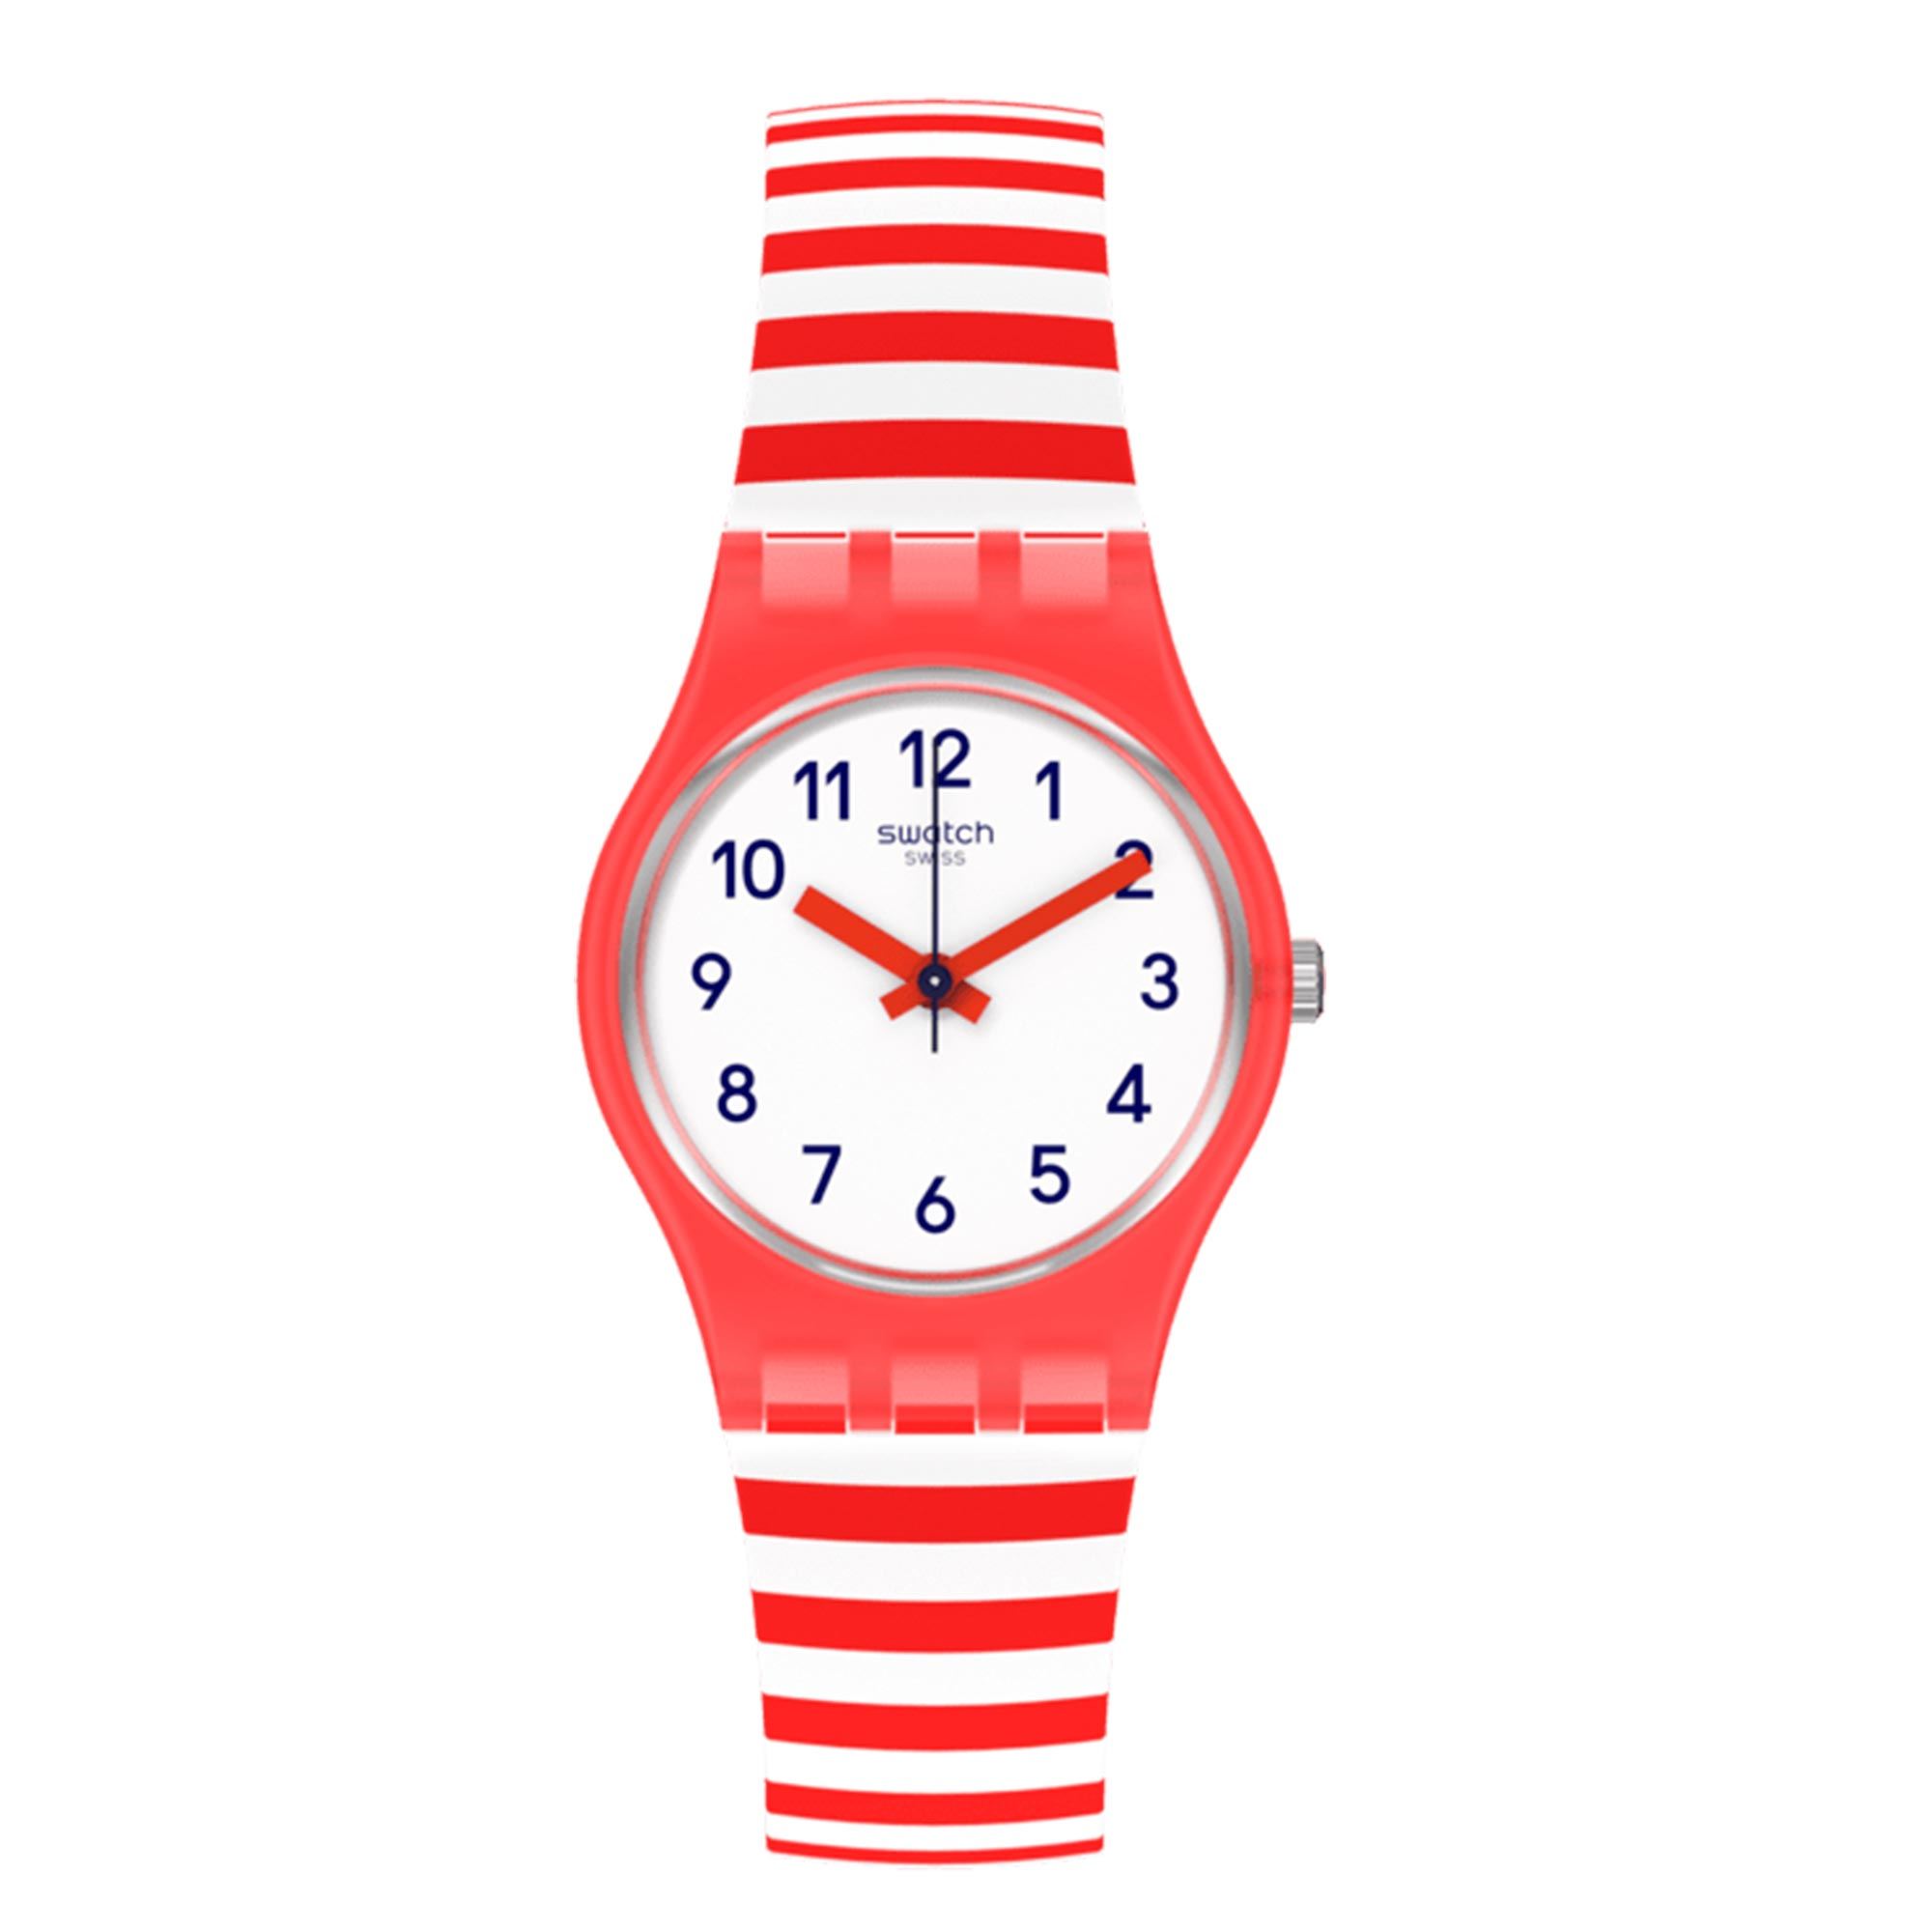 Swatch Original Lady Quartz White Dial Red Silicone Strap Watch LR135